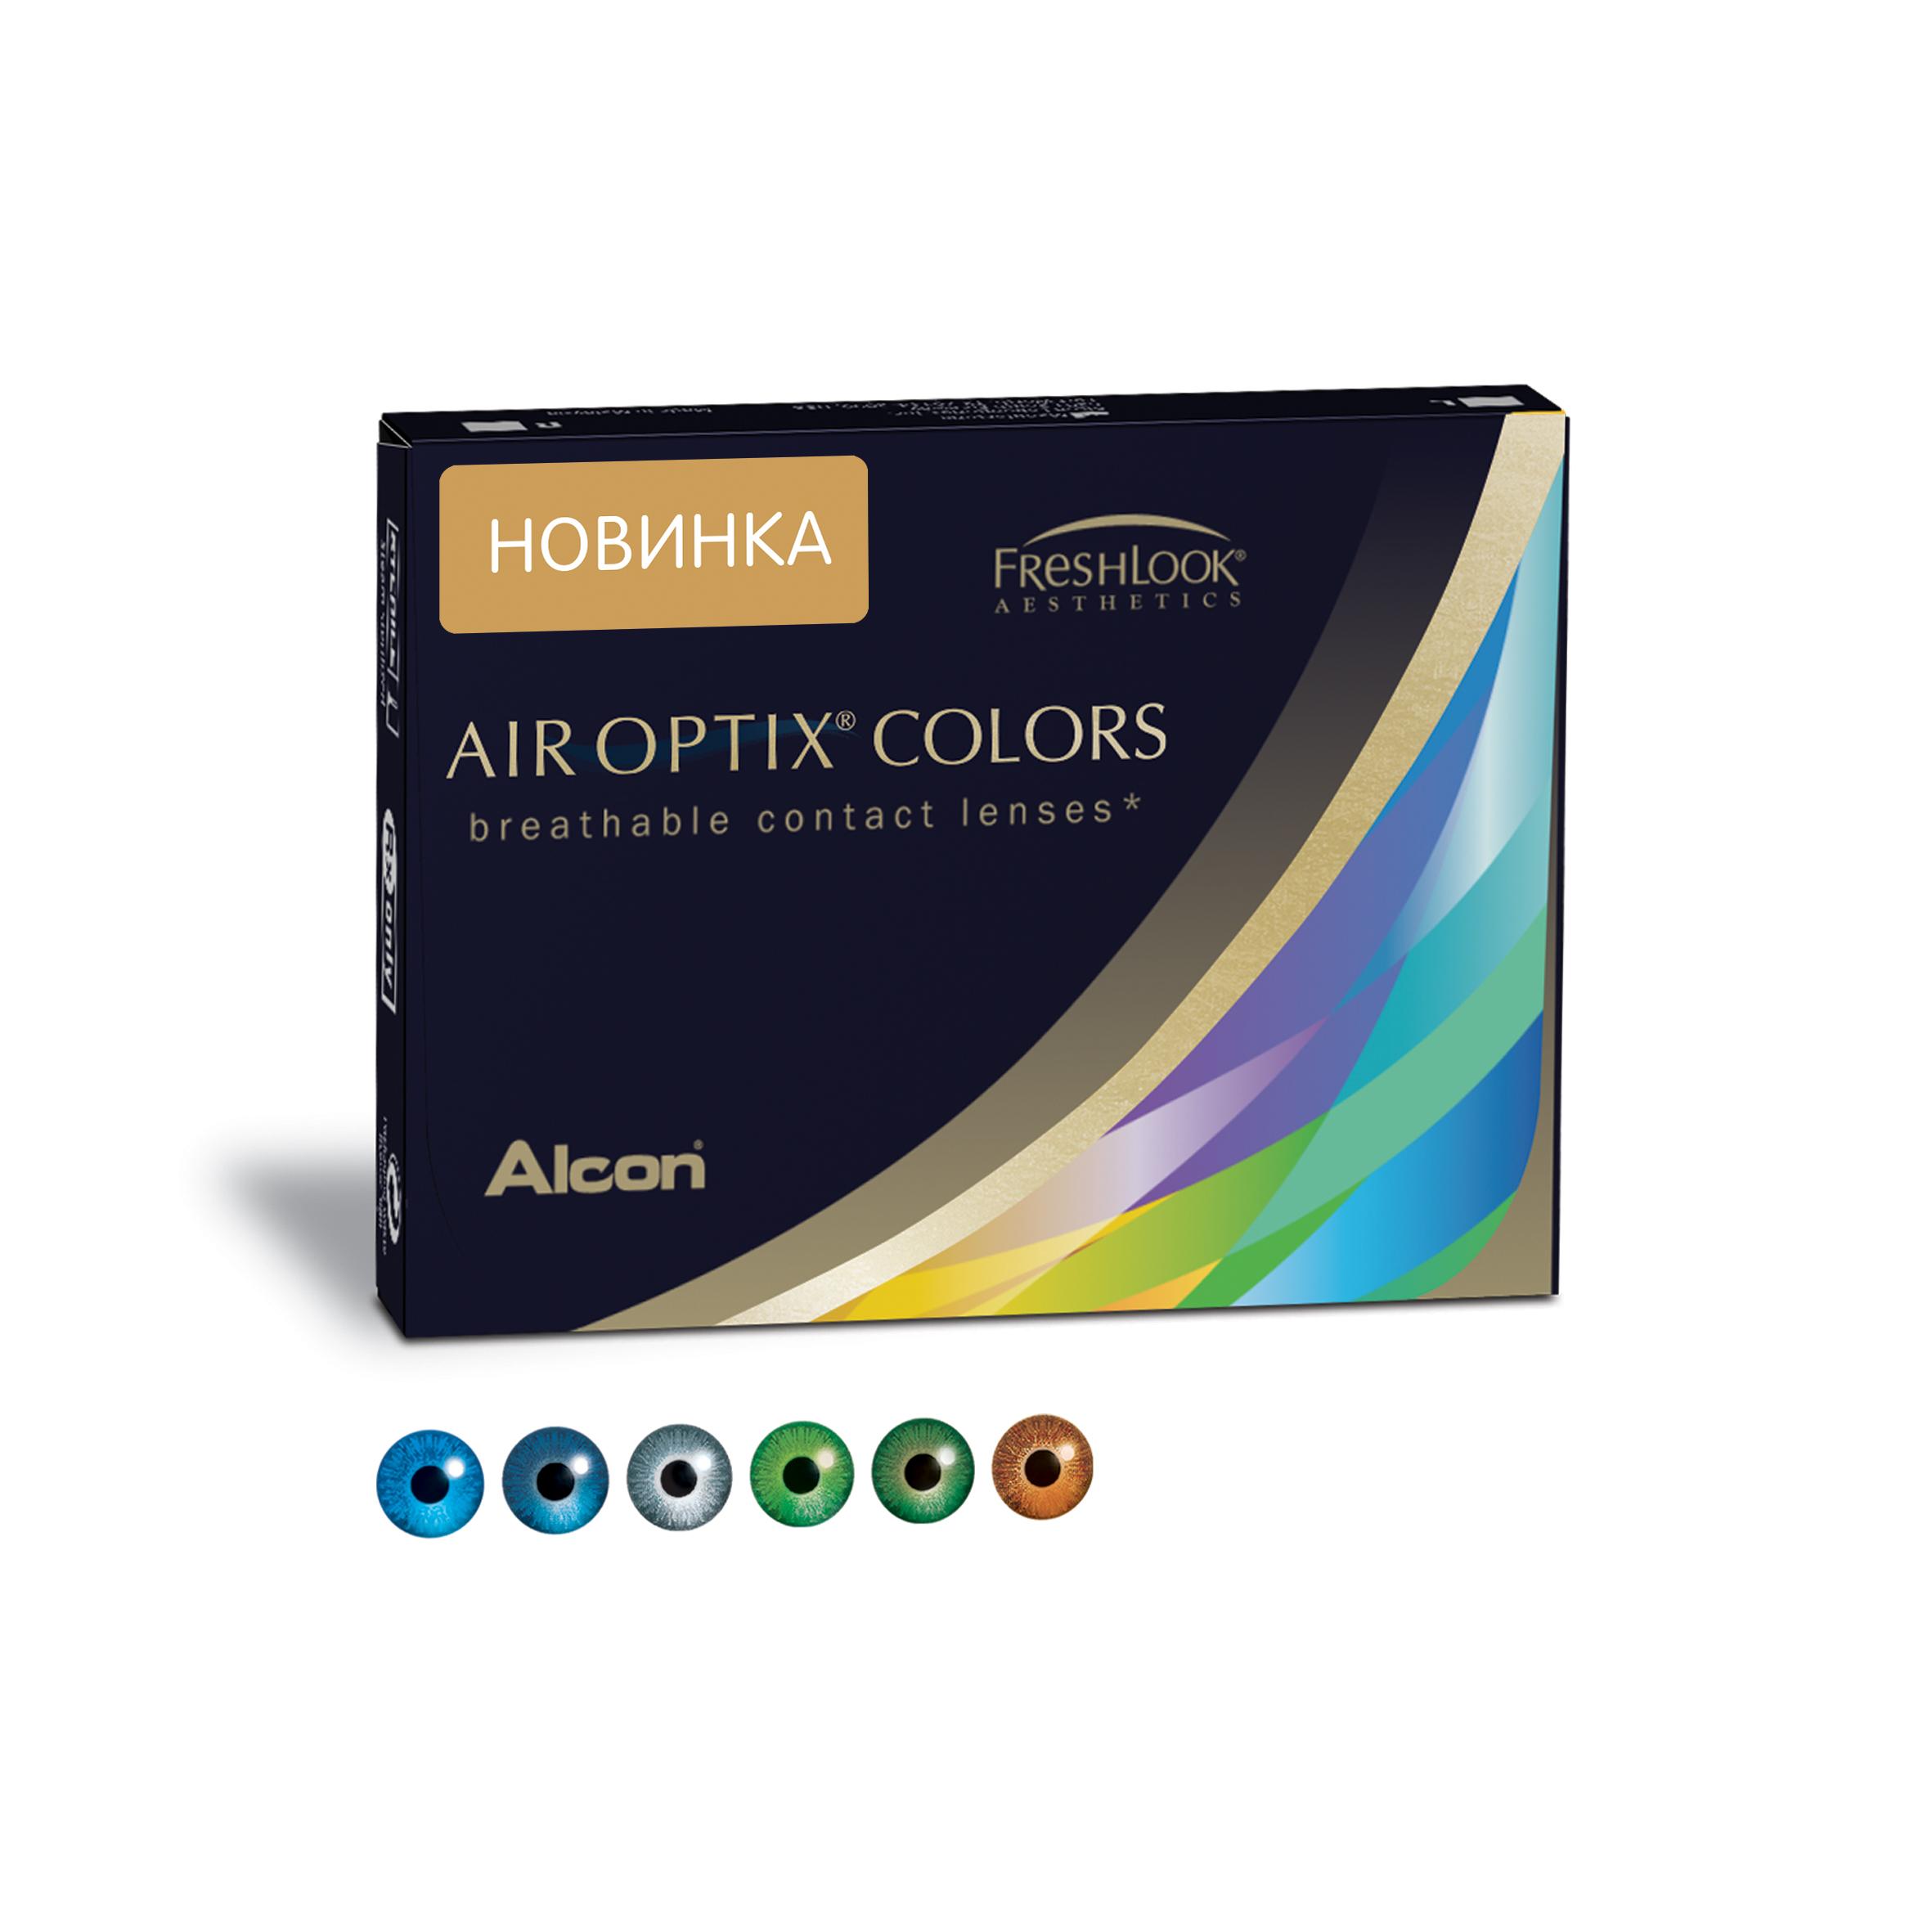 Аlcon контактные линзы Air Optix Colors 2 шт -3.25 Blue31746202Мягкие контактные линзы